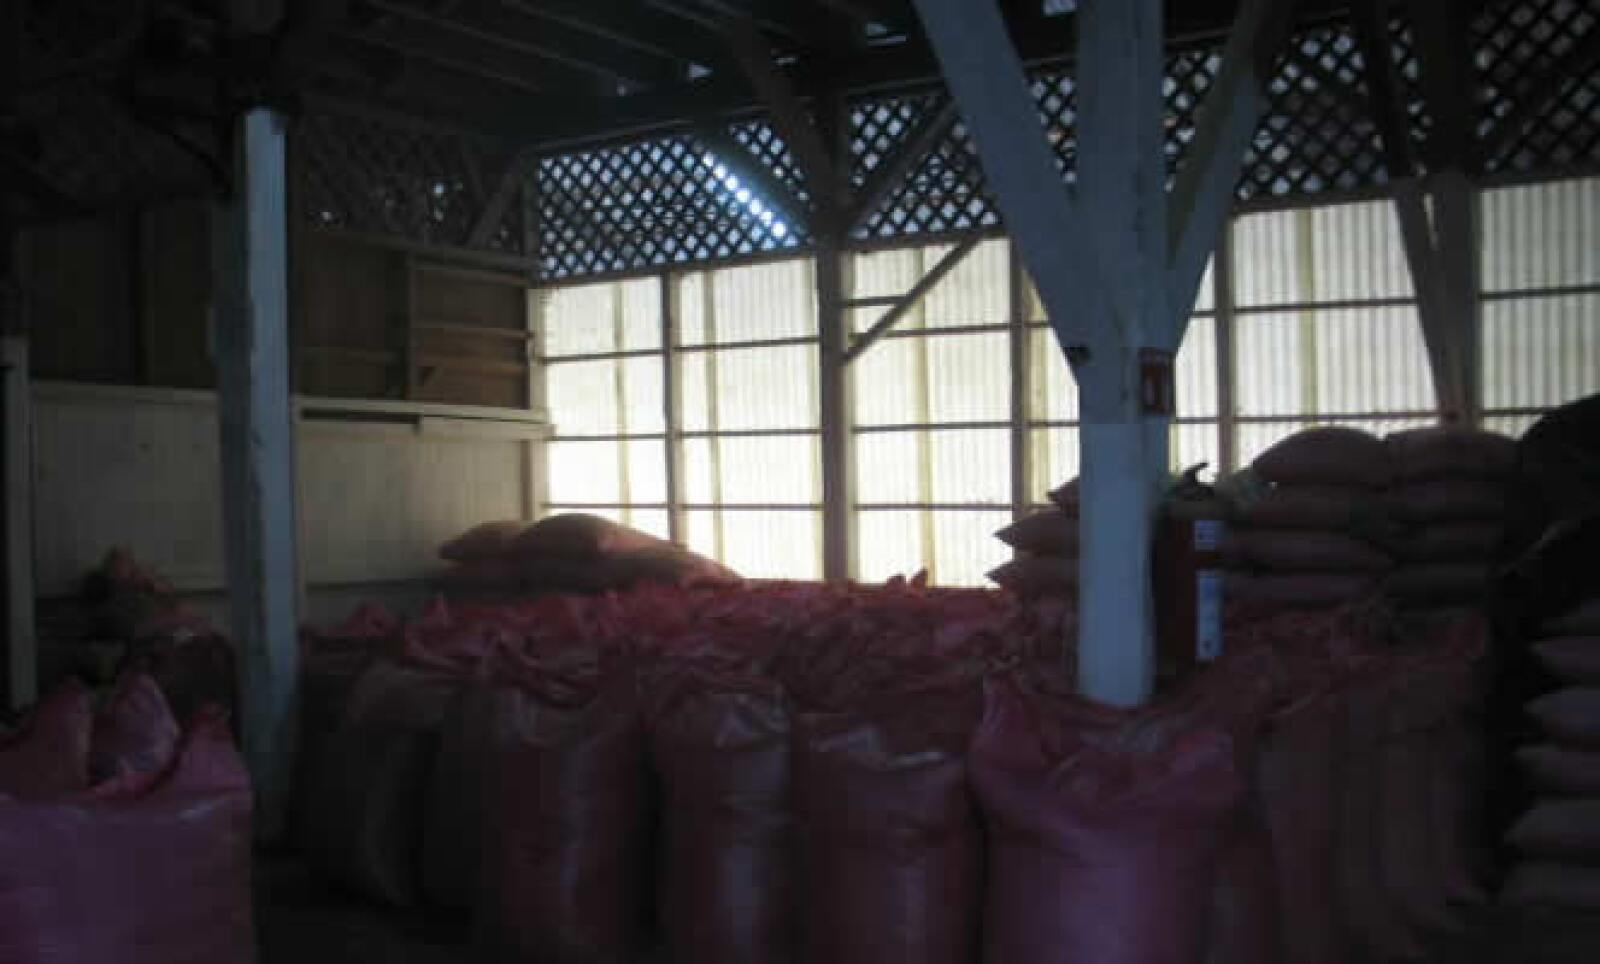 Un cultivo de café tarda 9 meses en estar listo para su cosecha